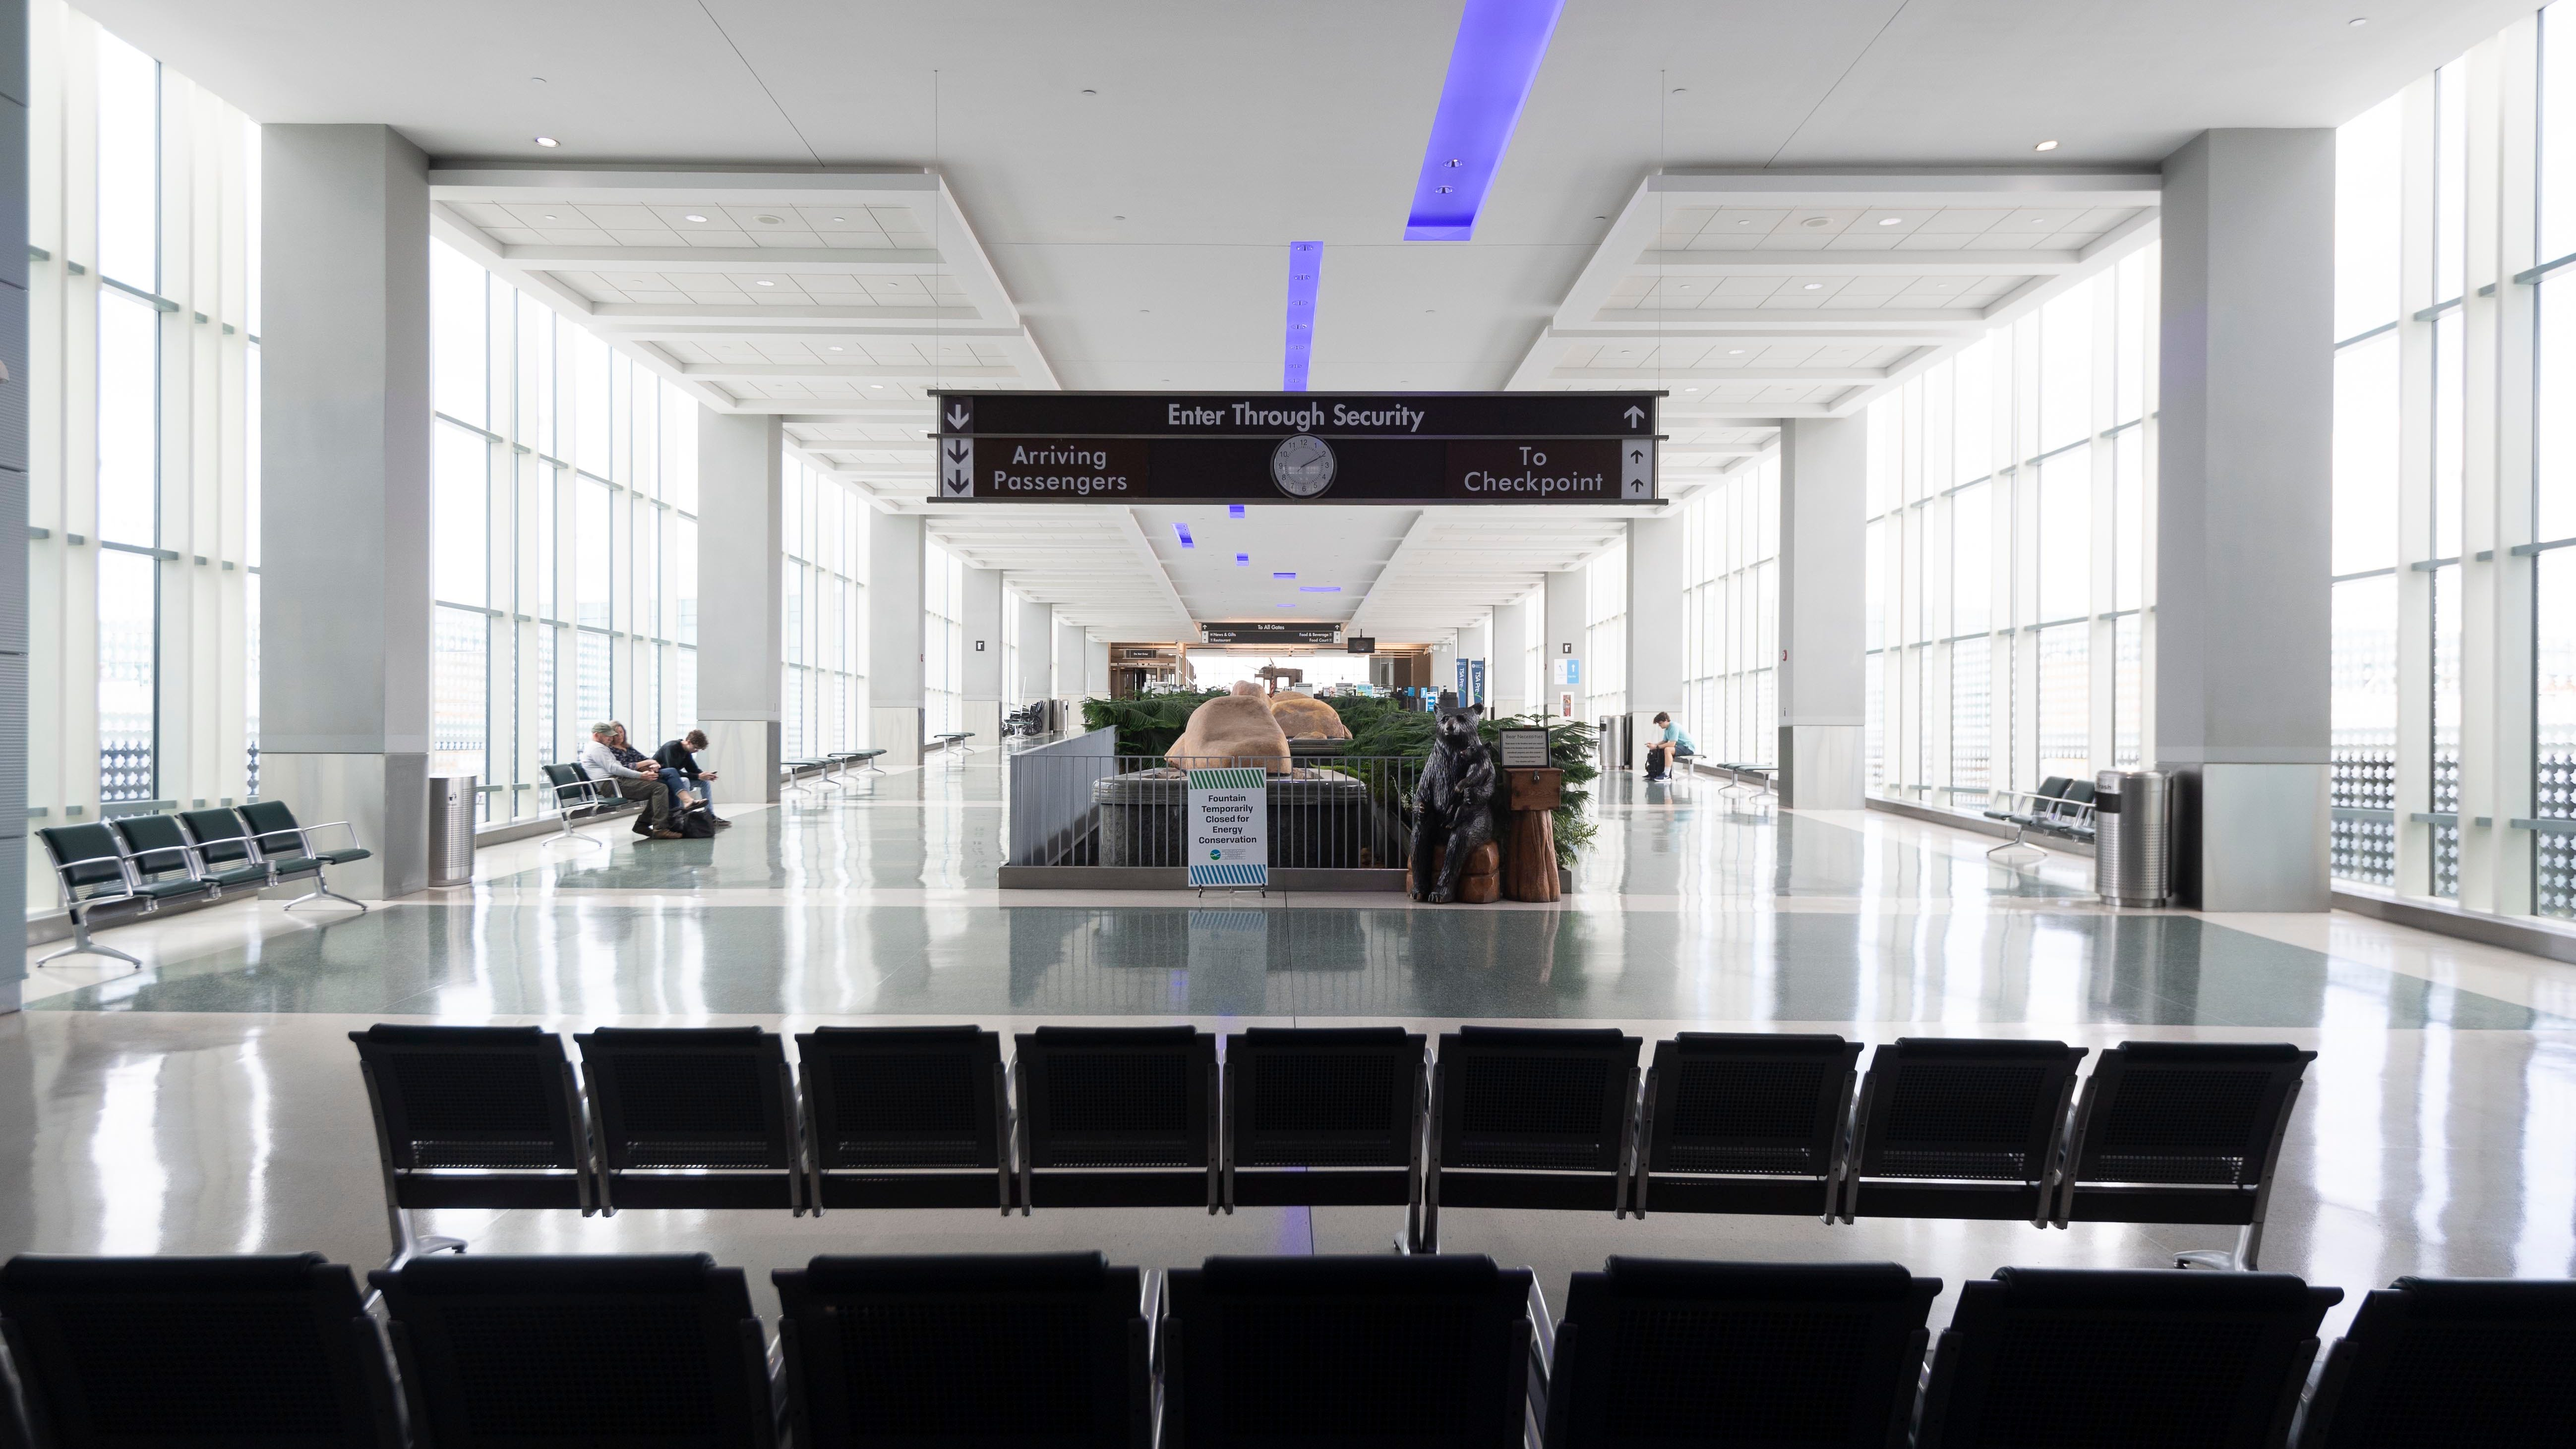 McGhee Tyson Airport's traffic took a shocking hit in 2020